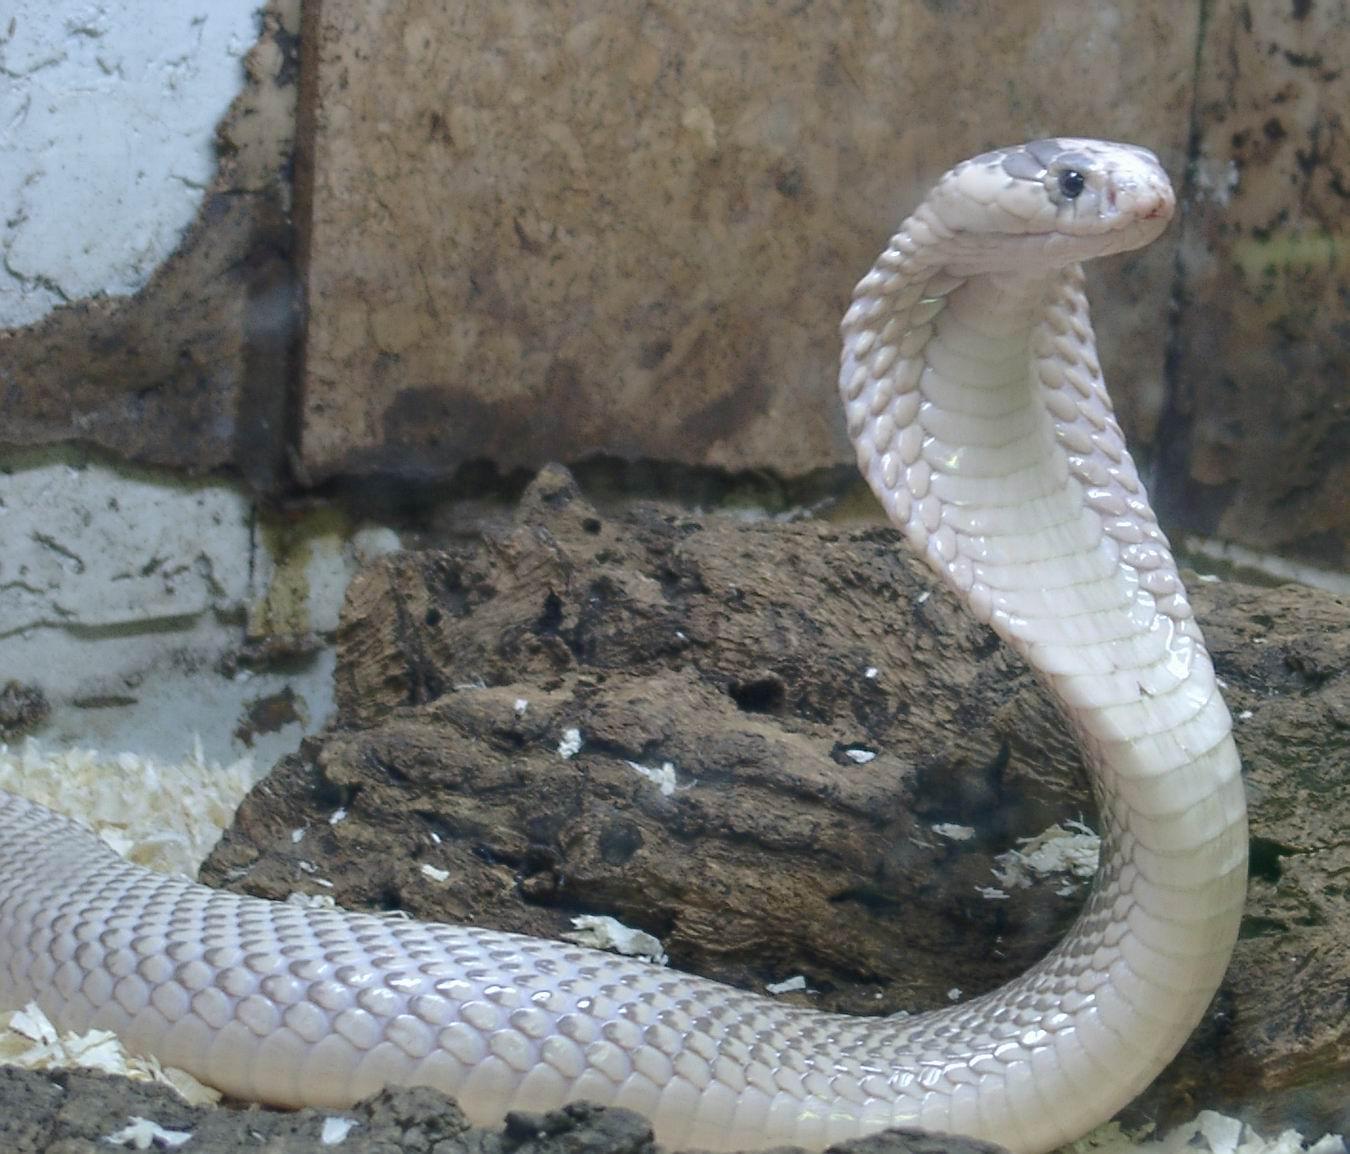 Cobra Snake Hd Wallpapers Cool Desktop Background Pictures Widescreen 1350x1154